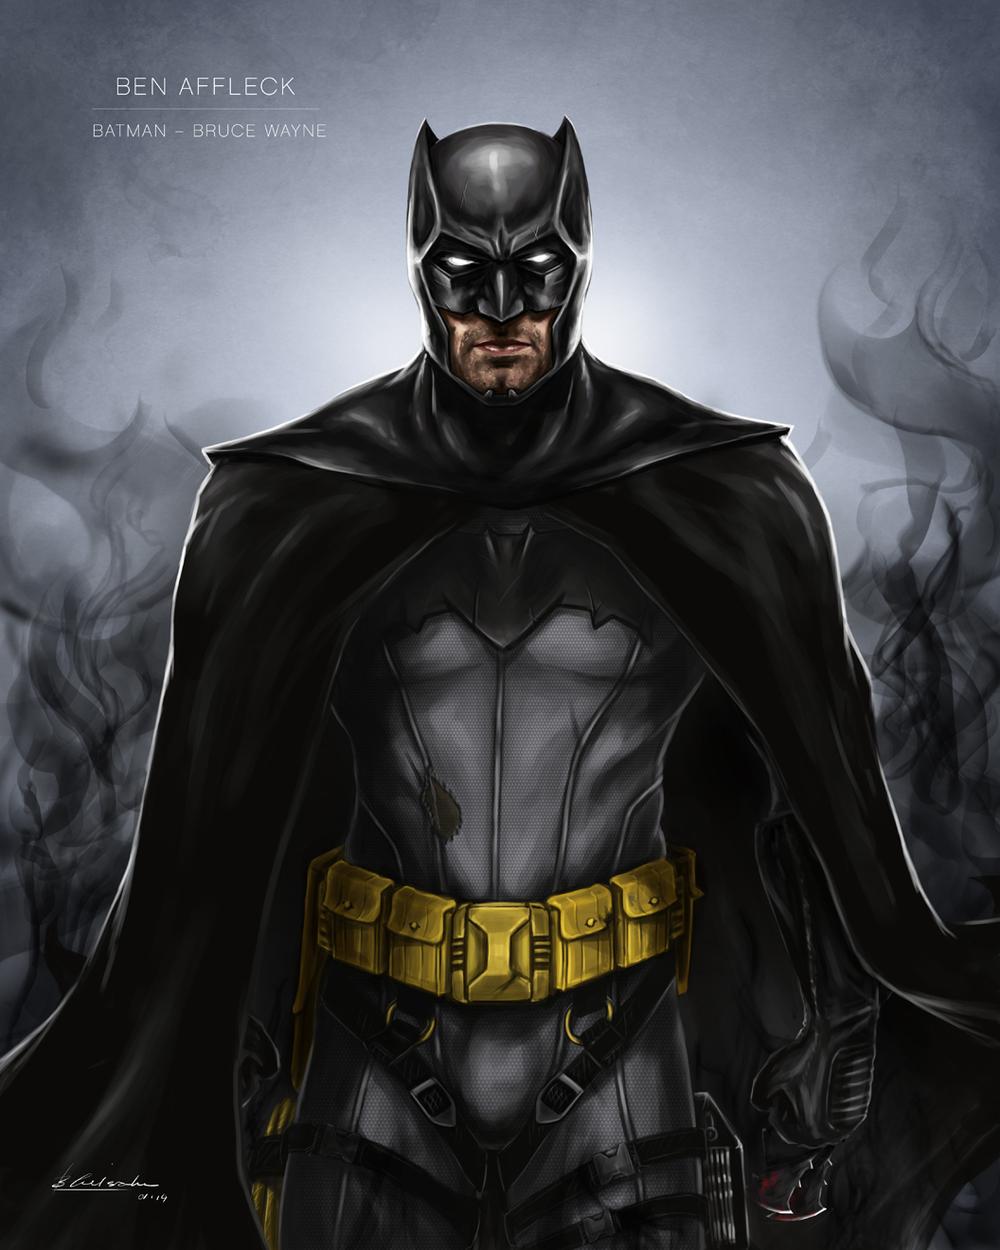 Ben_Affleck_Batman_concept.jpg